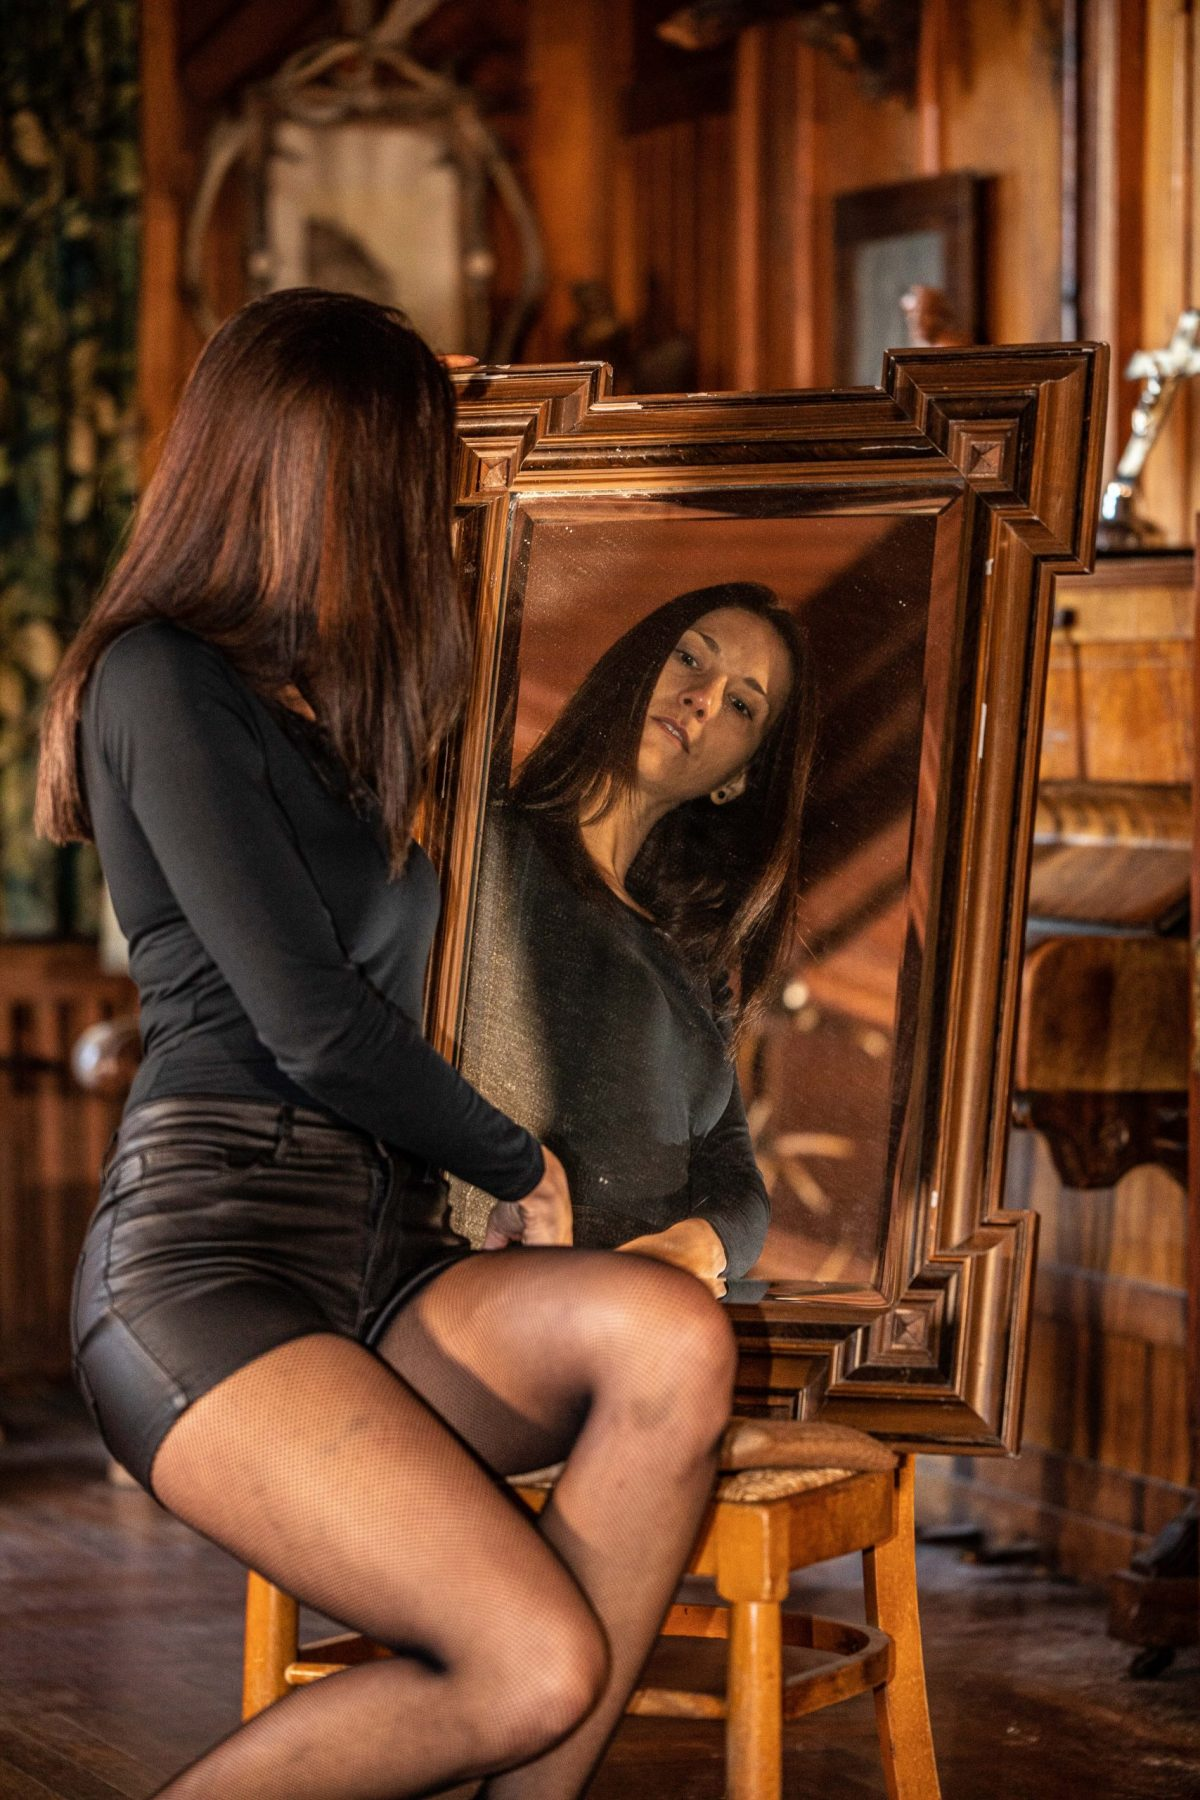 mtubach Photografie | Portraitshooting Natalie